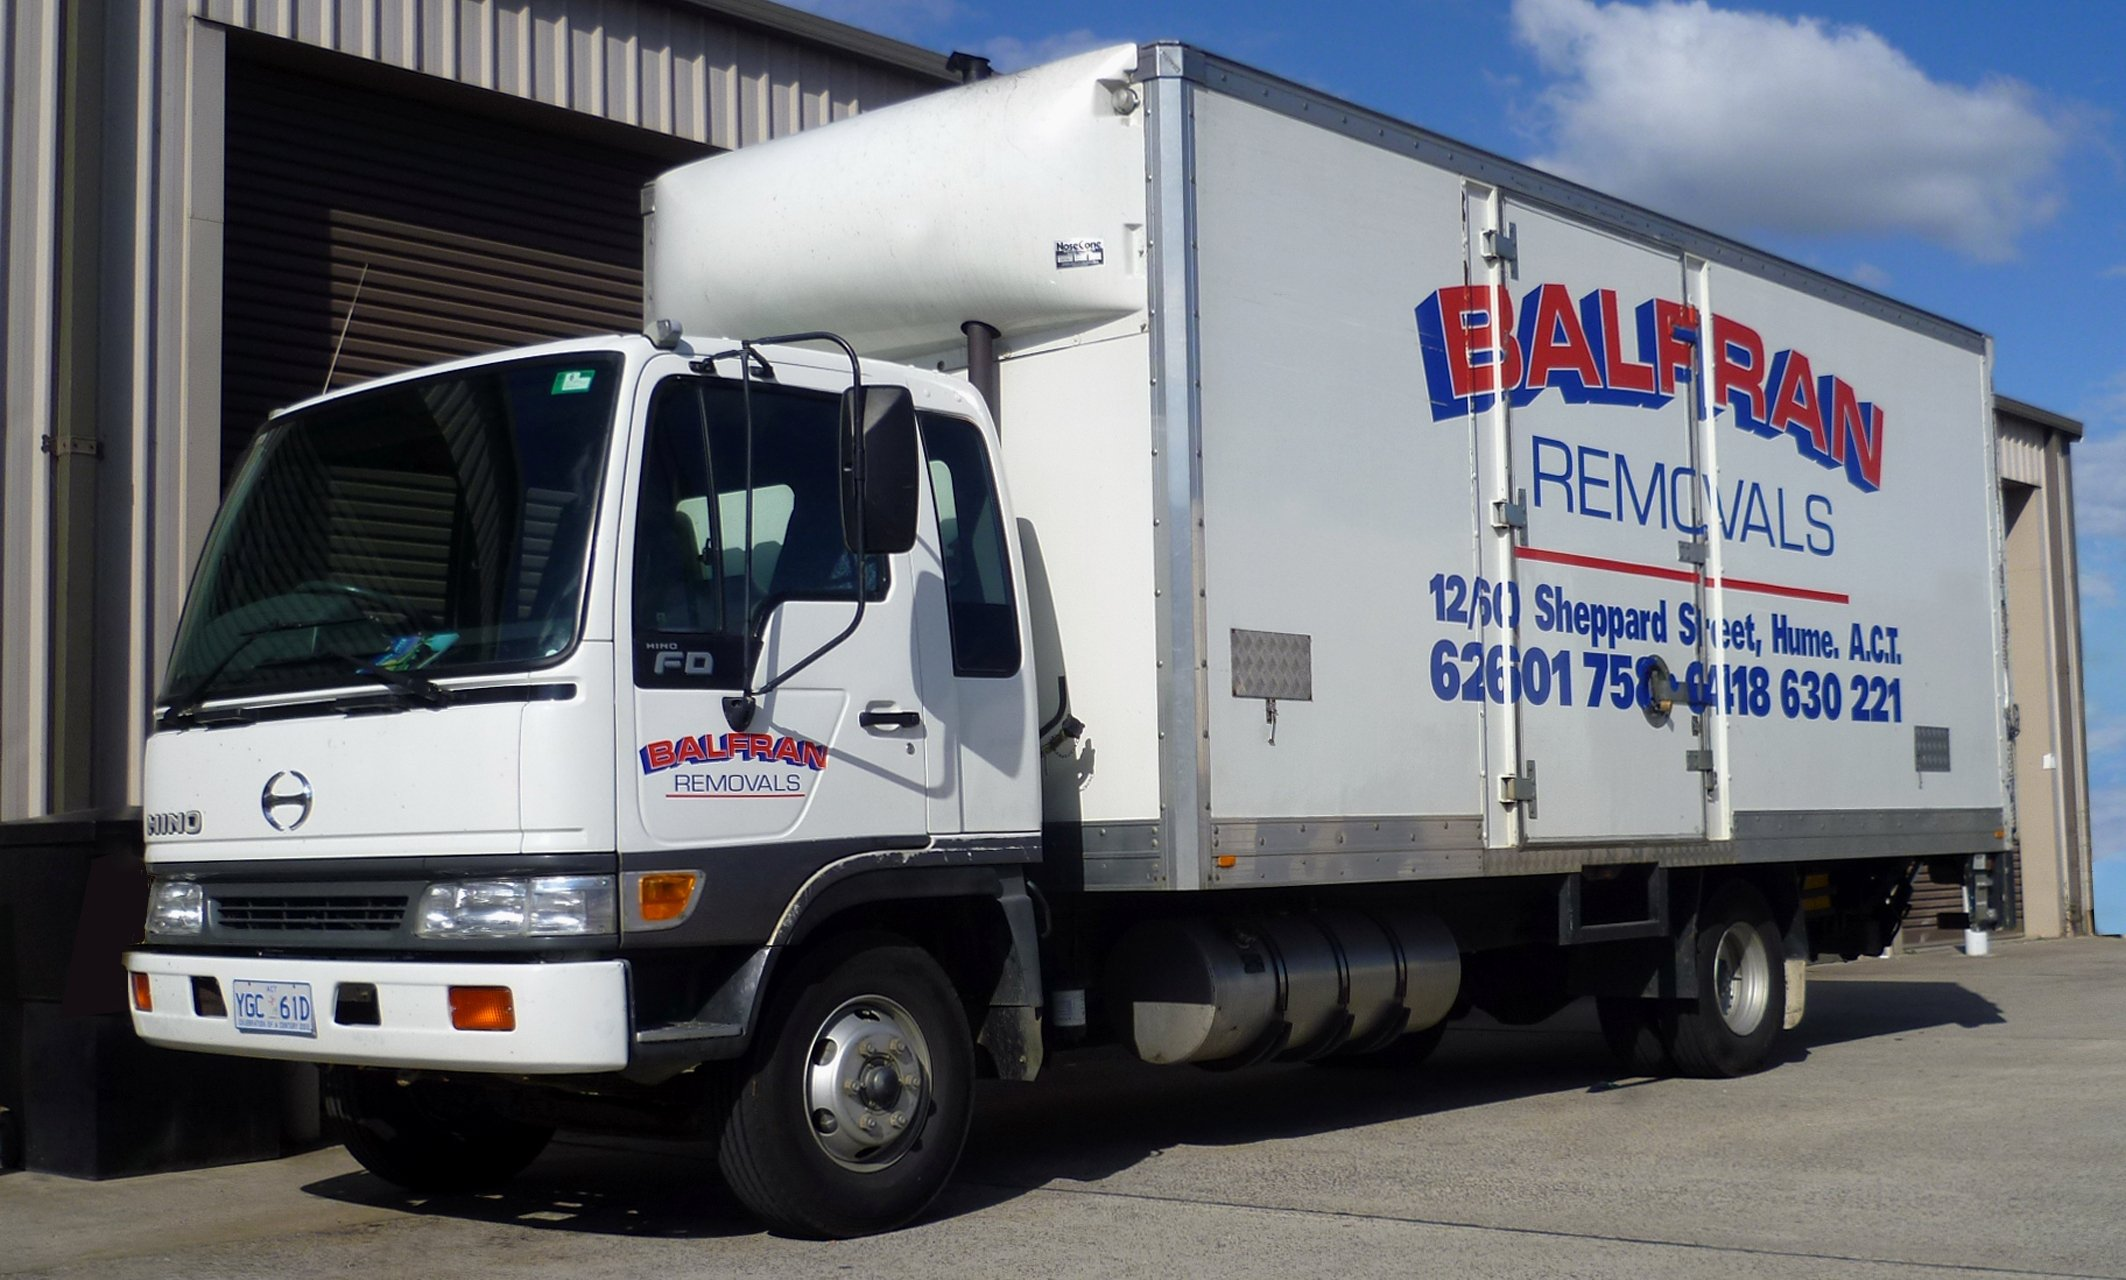 Balfran Truck - removals